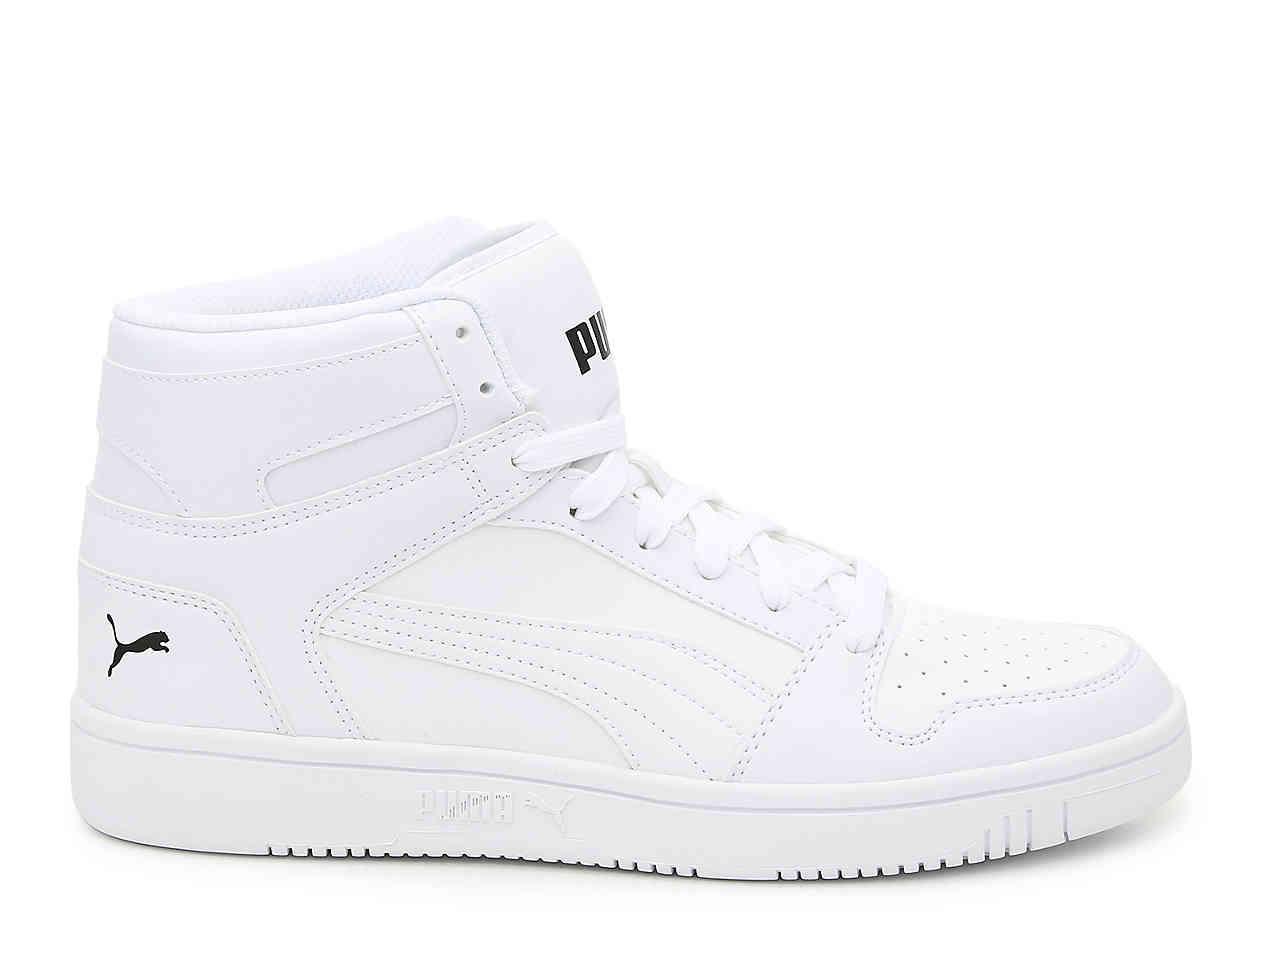 PUMA Rebound Layup Sl High-top Sneaker